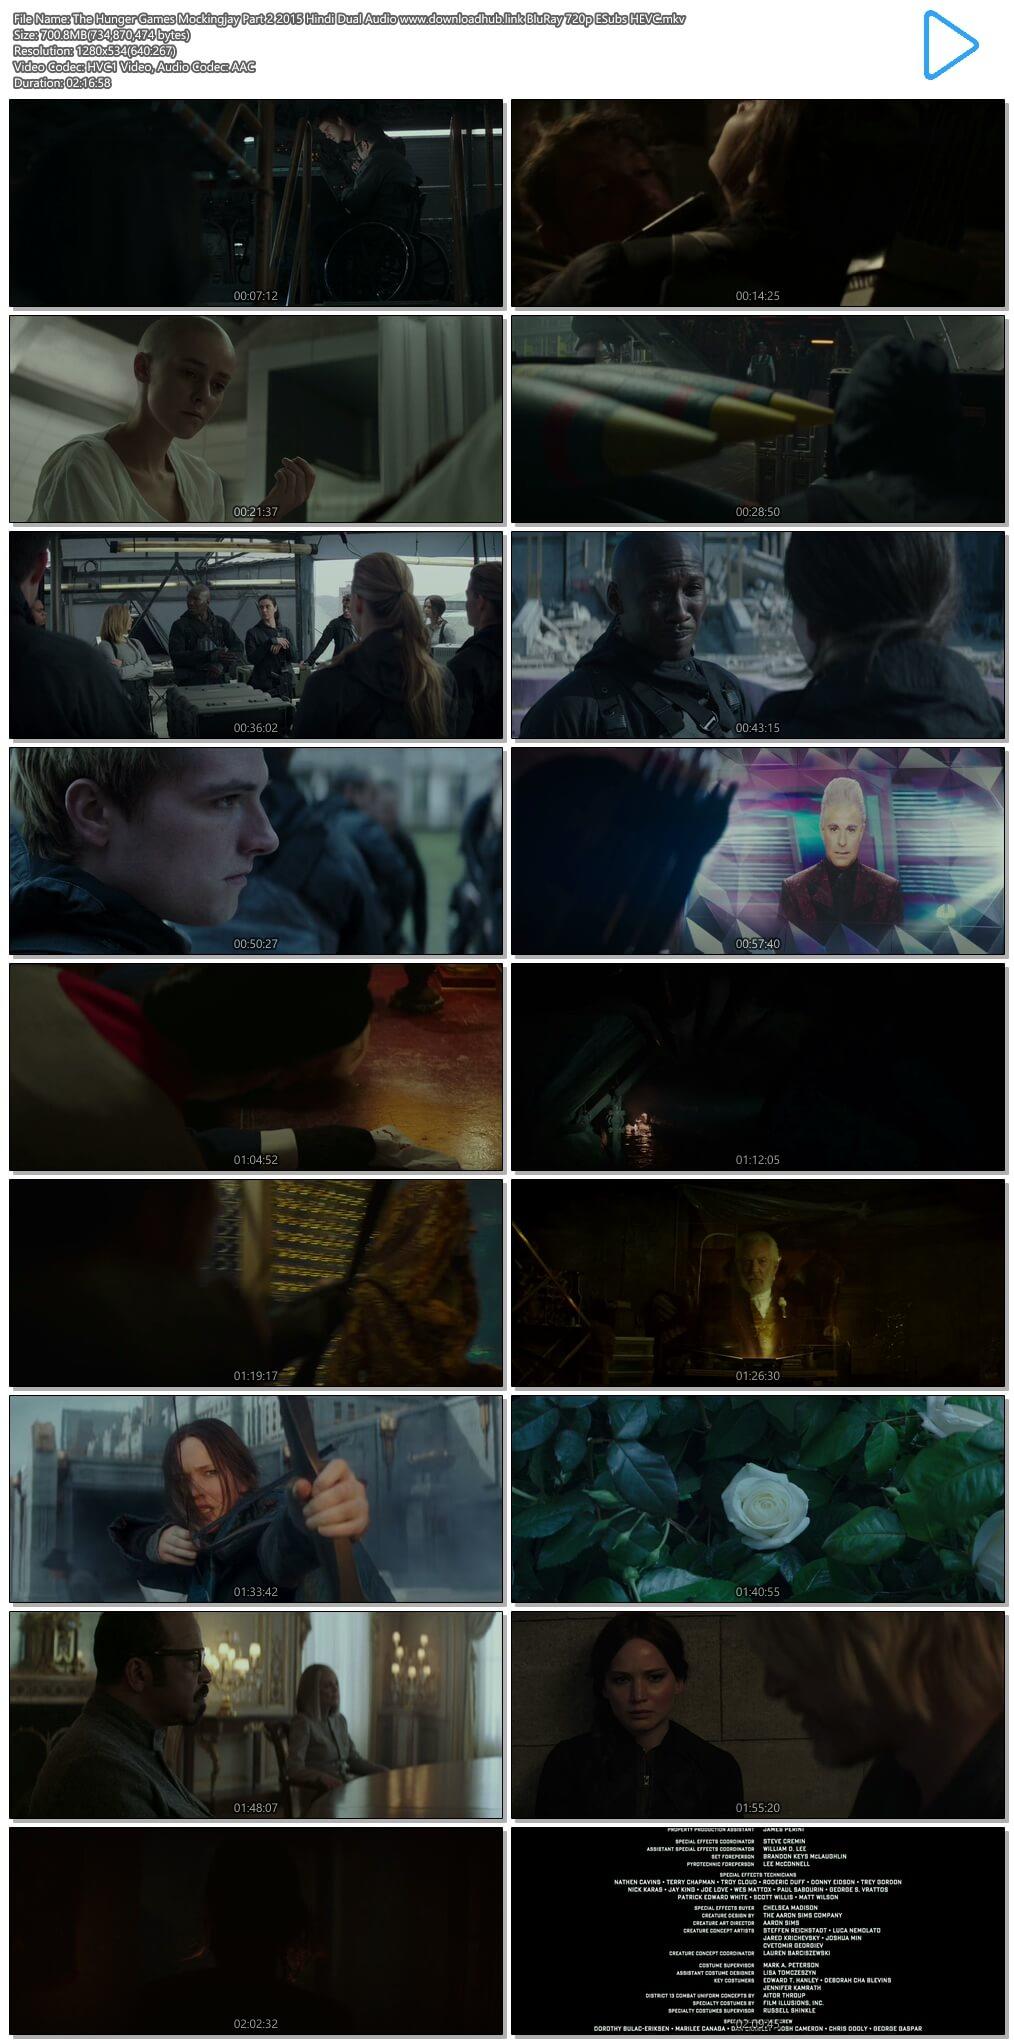 The Hunger Games Mockingjay Part 2 2015 Hindi Dual Audio 700MB BluRay 720p ESubs HEVC